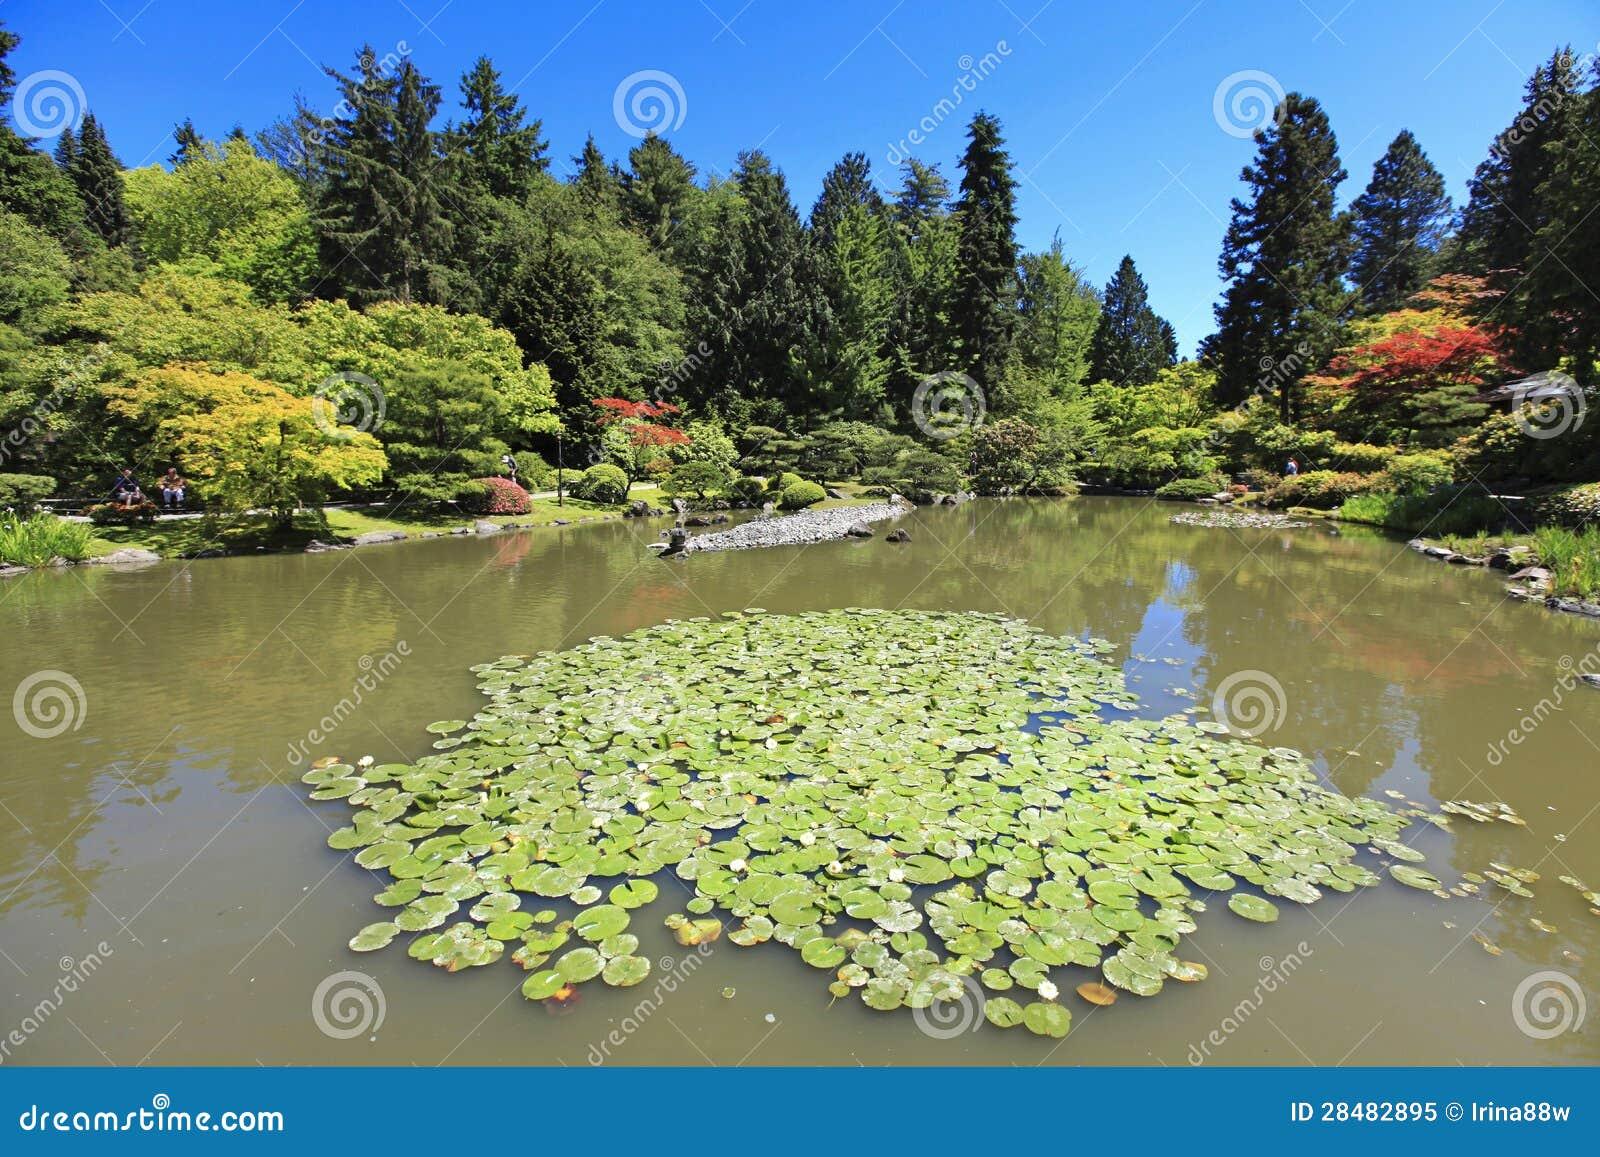 giardino giapponese a seattle wa stagno con le ninfee